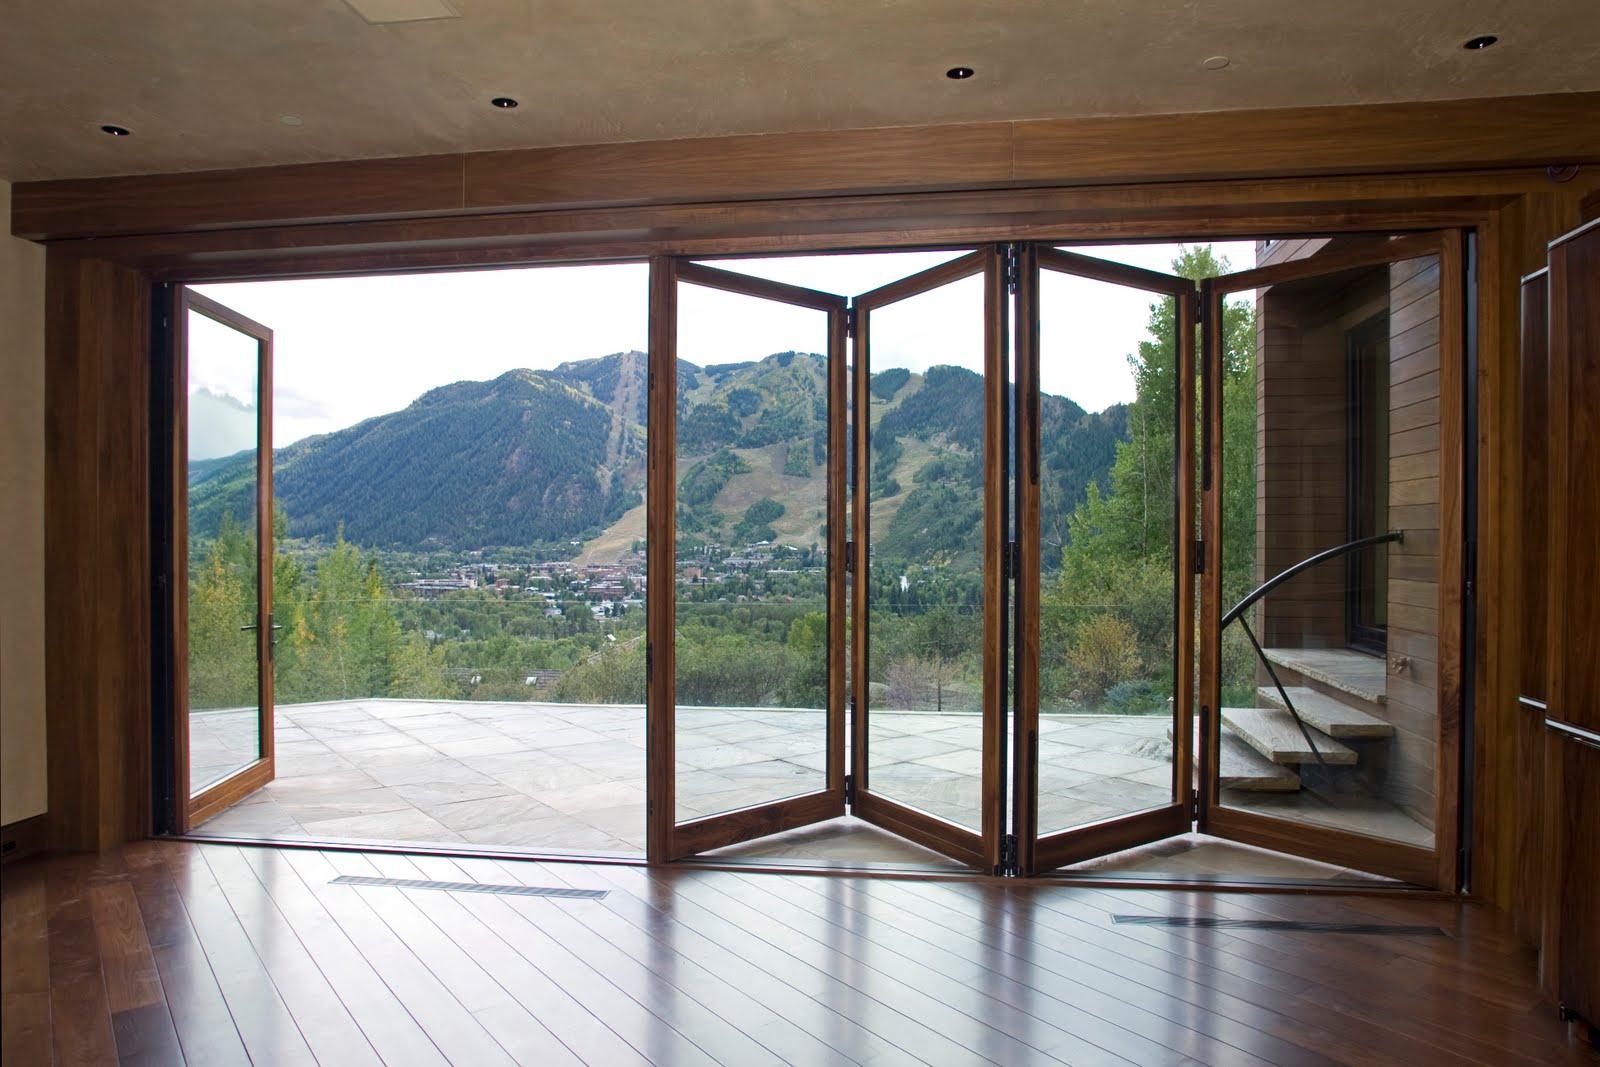 Grabill Windows and Doors: Product Highlight: Folding Doors